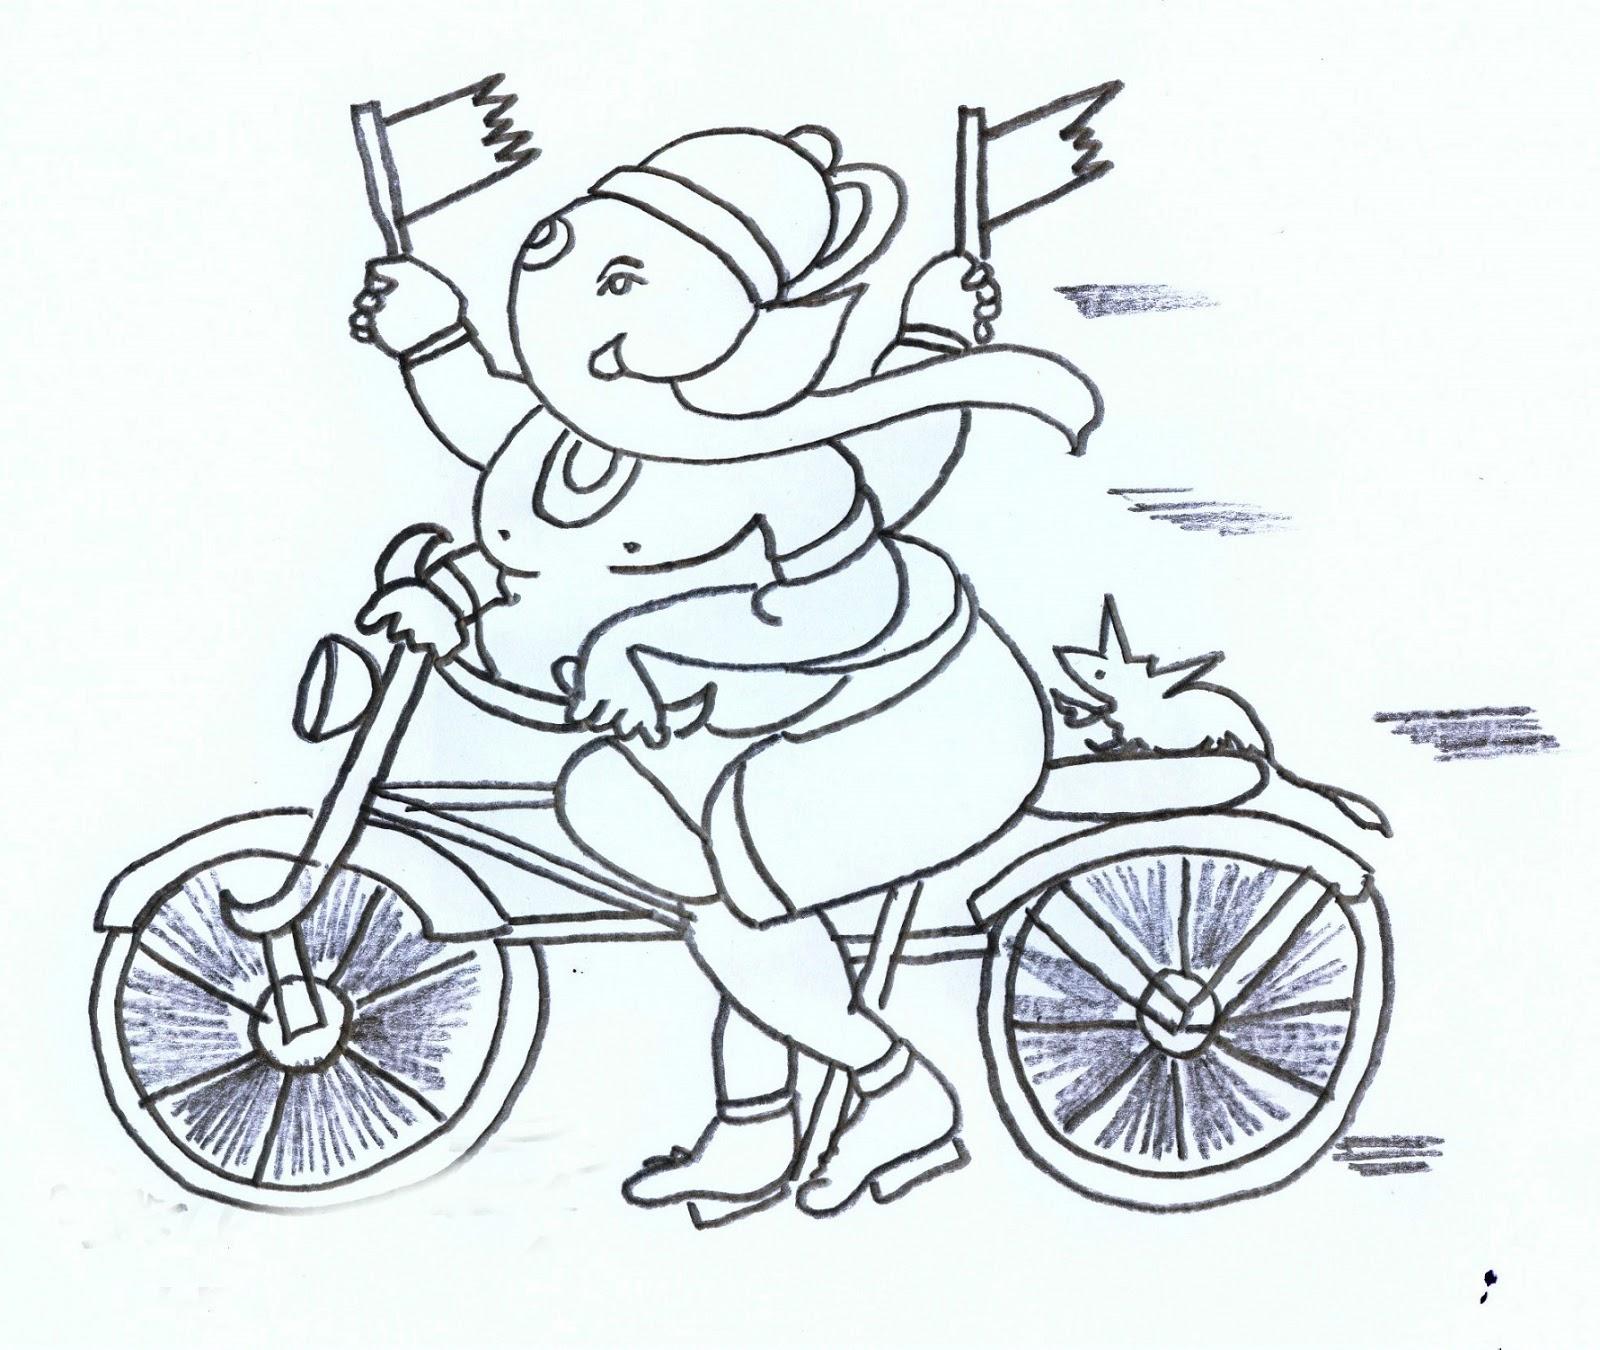 essay on lord ganesha essay on lord ganesha s ganesh chaturthi festival essay lord of essay on ganesh chaturthi